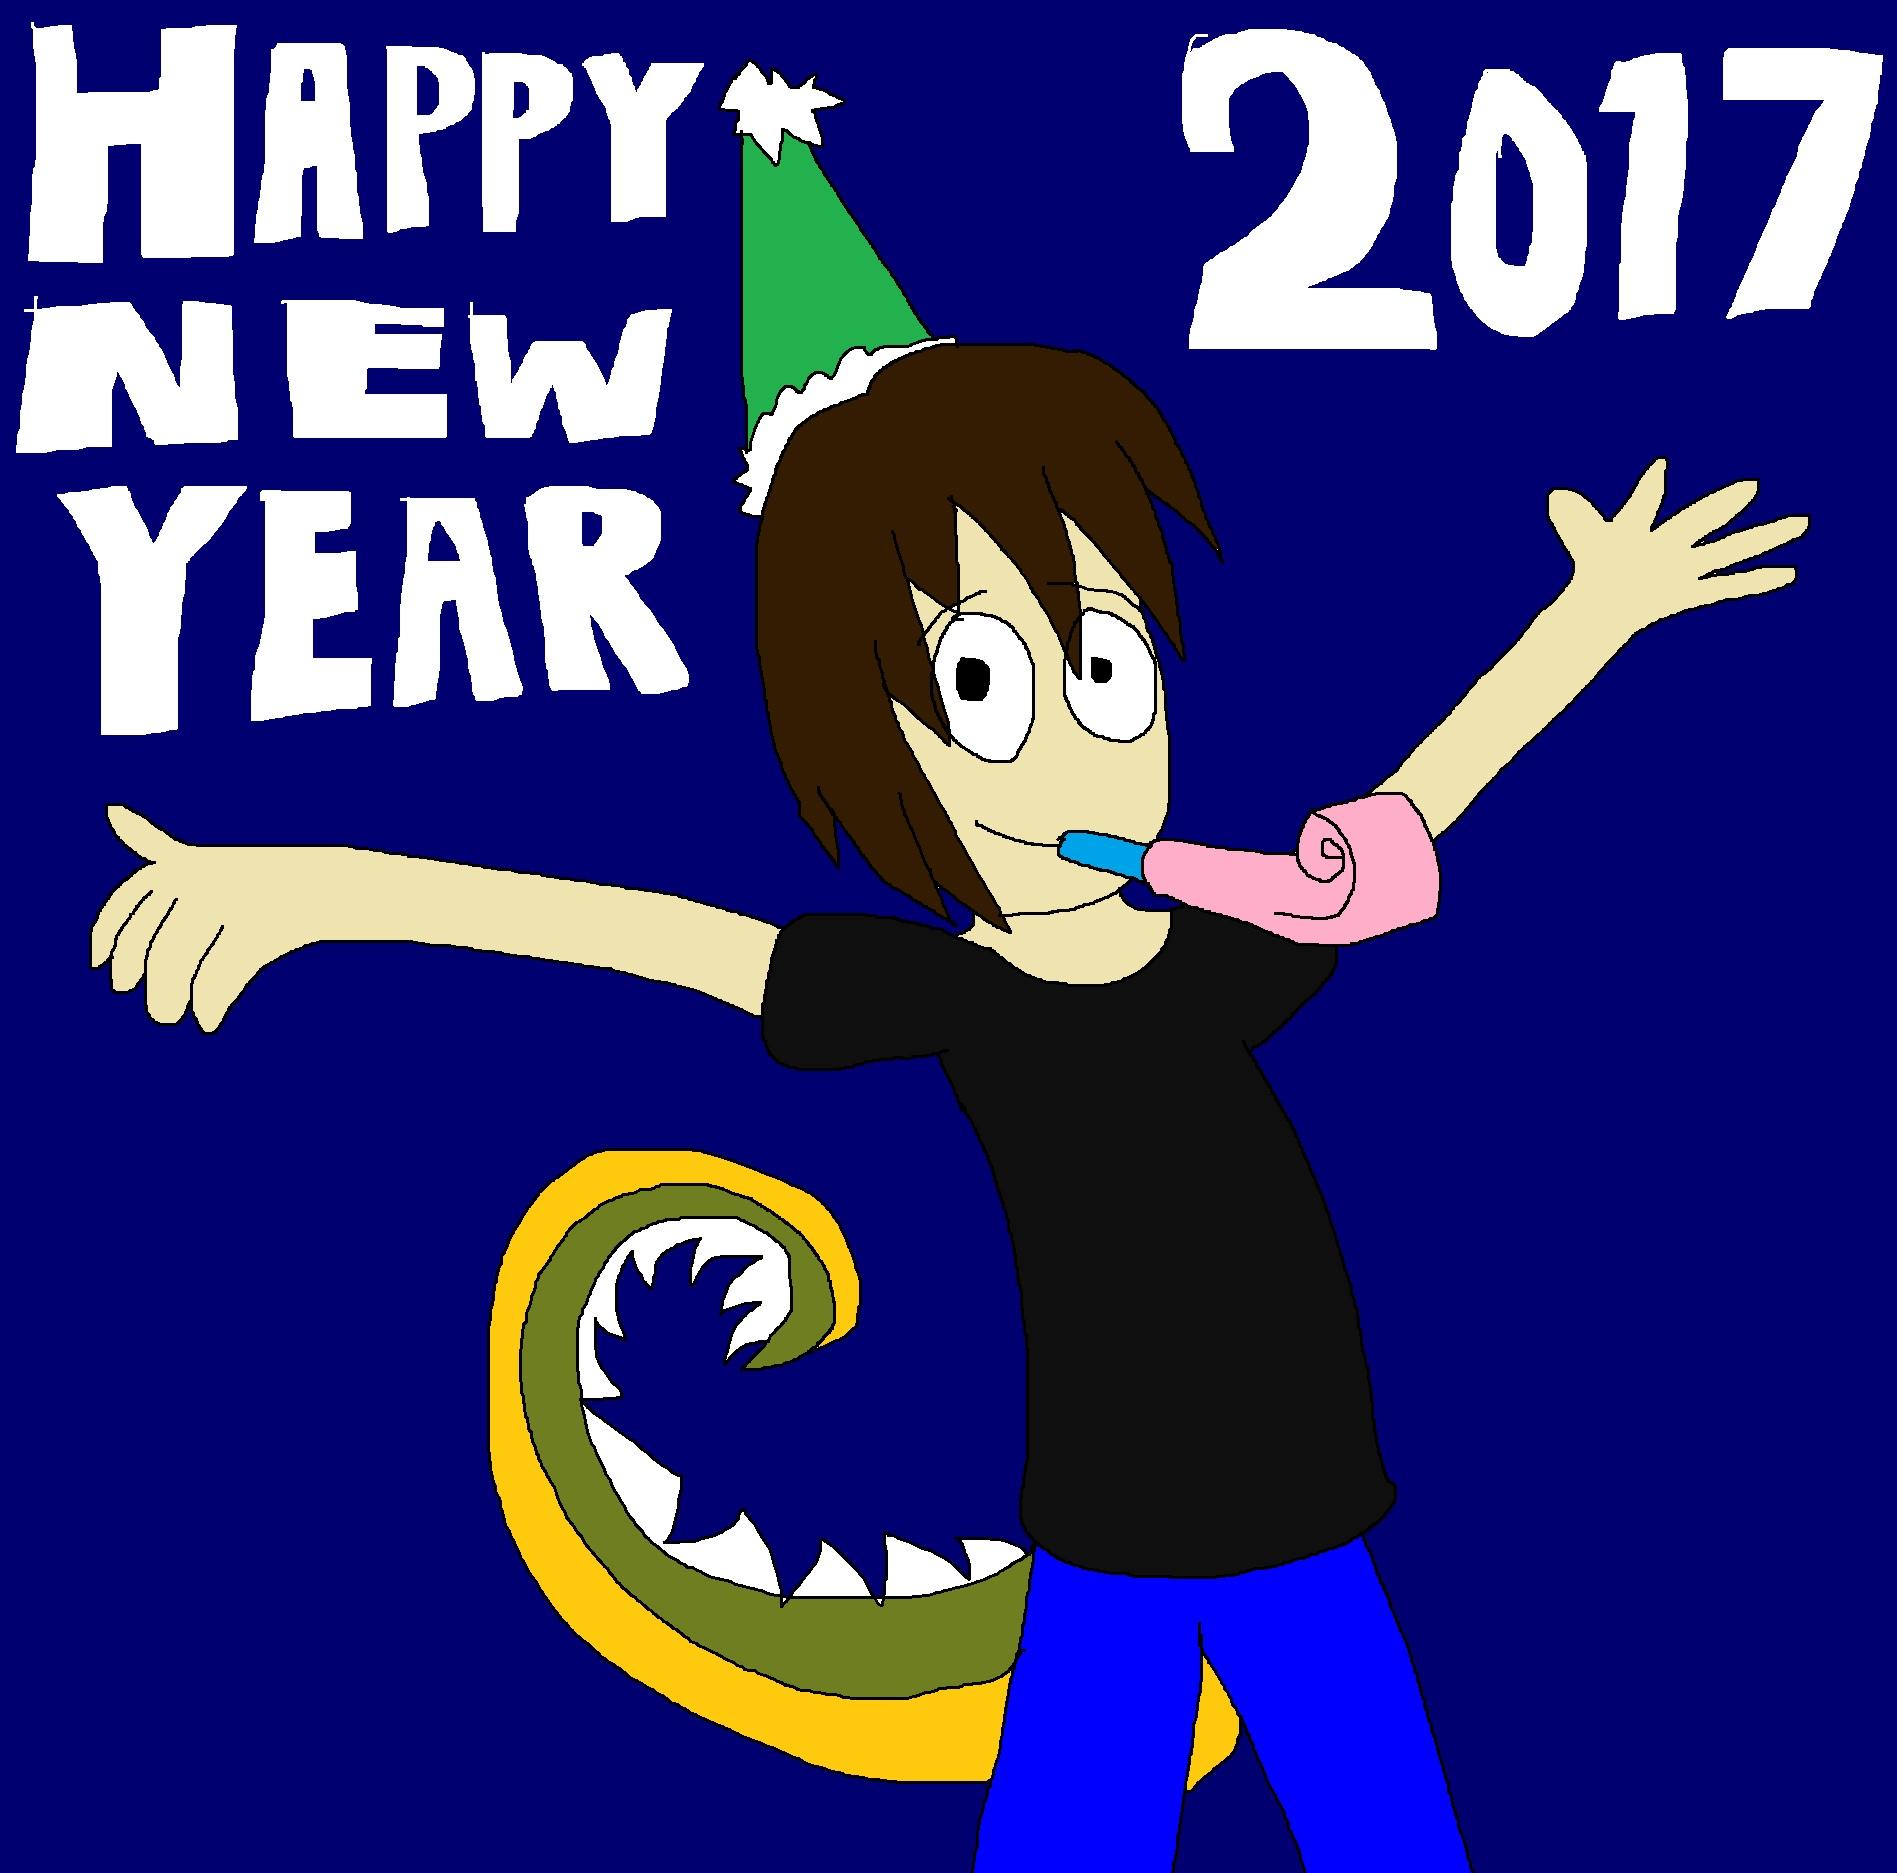 Happy New Year 2017 by Rainbow-Dash-Rockz